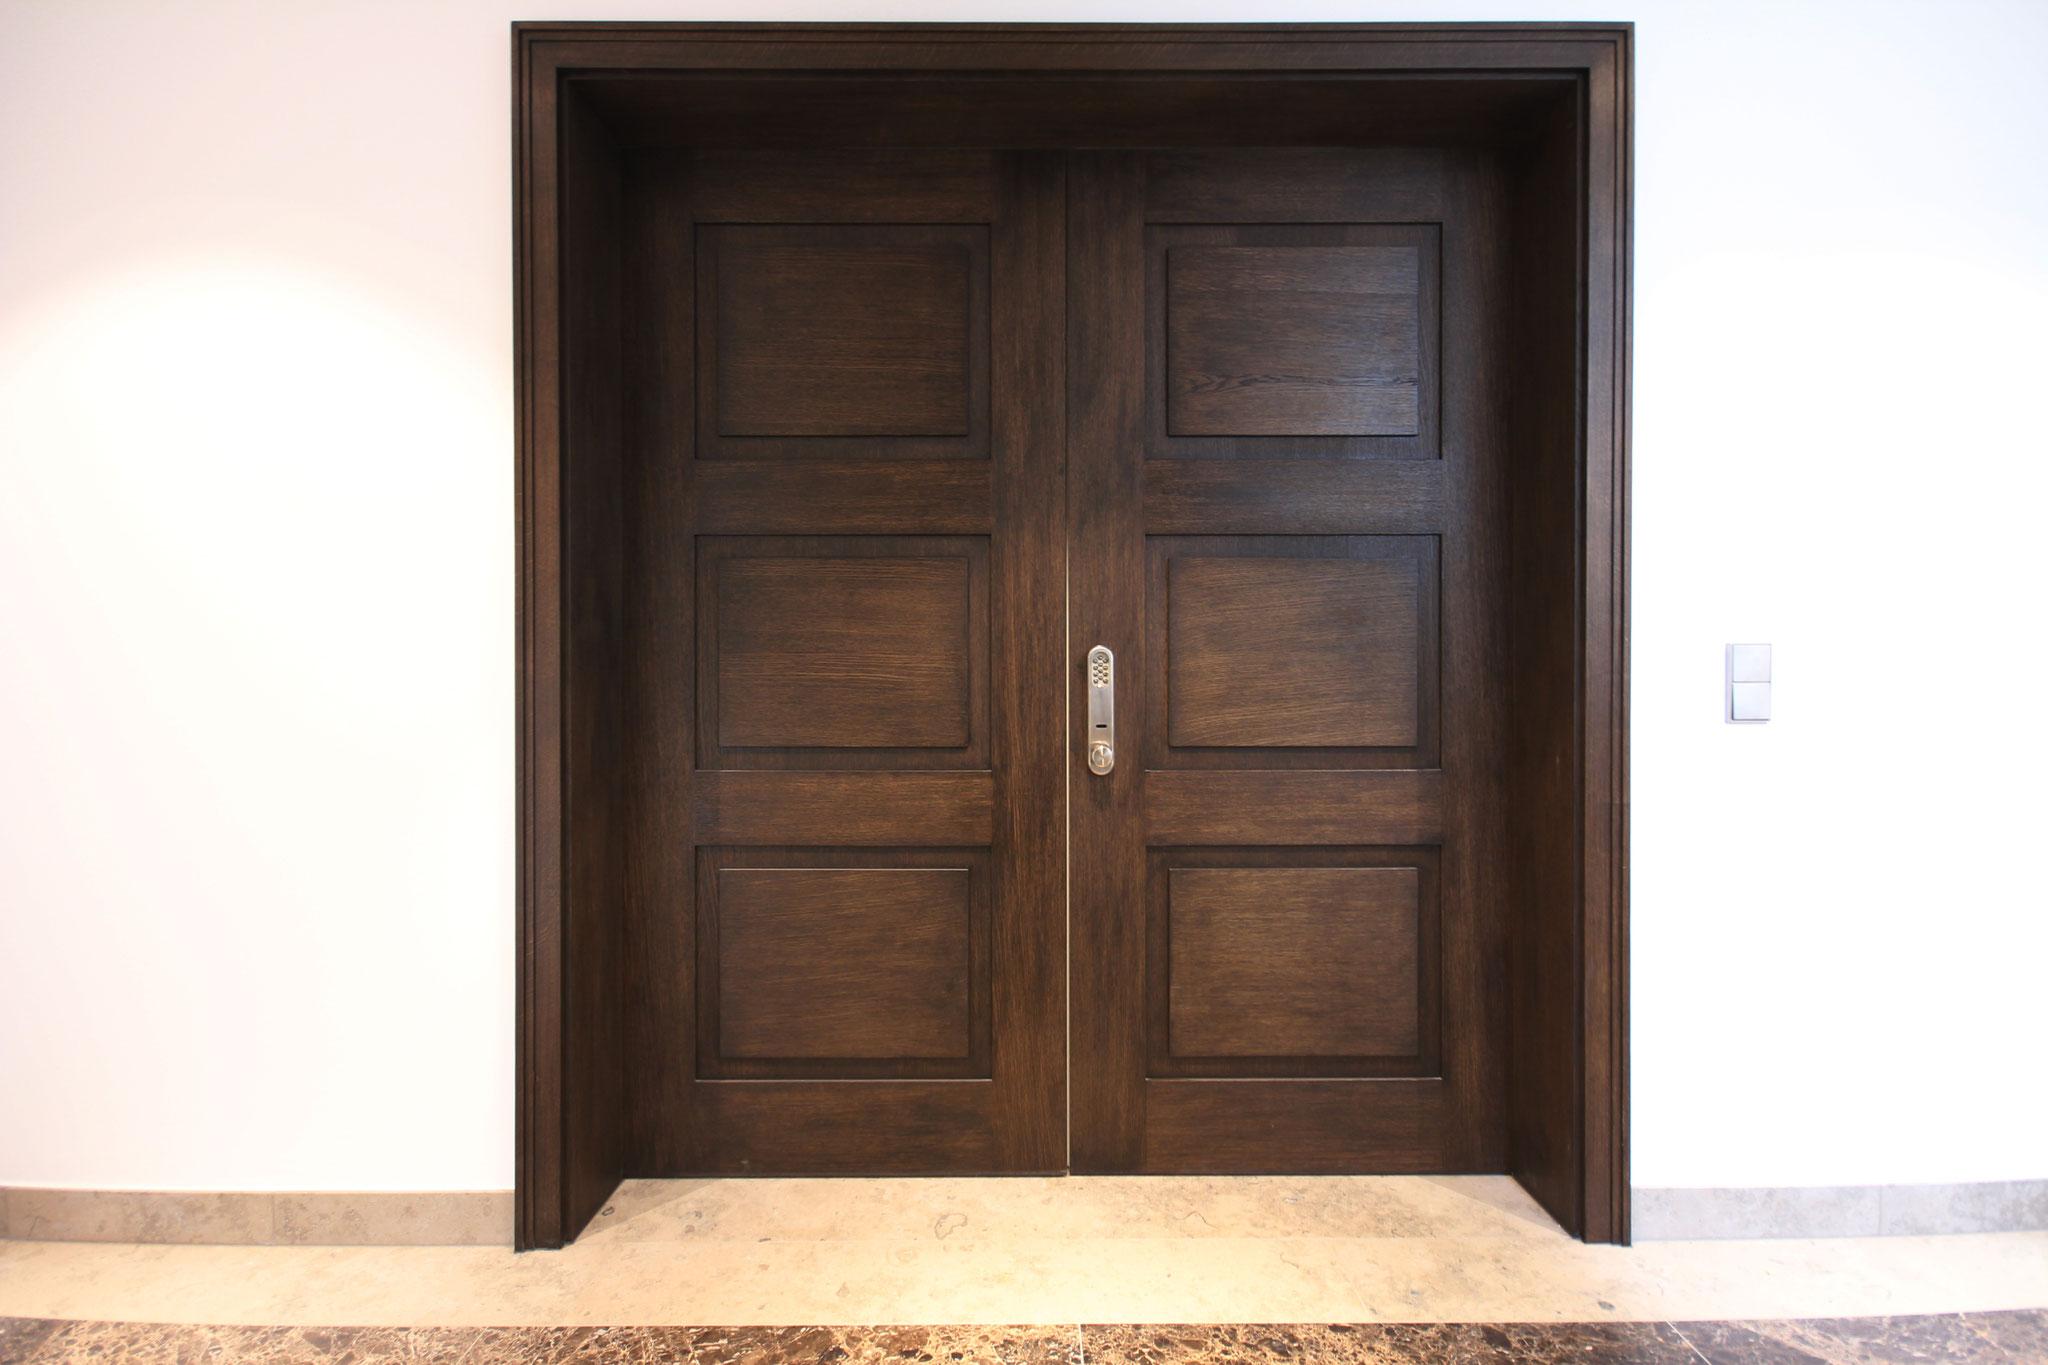 Doppelflügelige Eingangstüre 1. OG